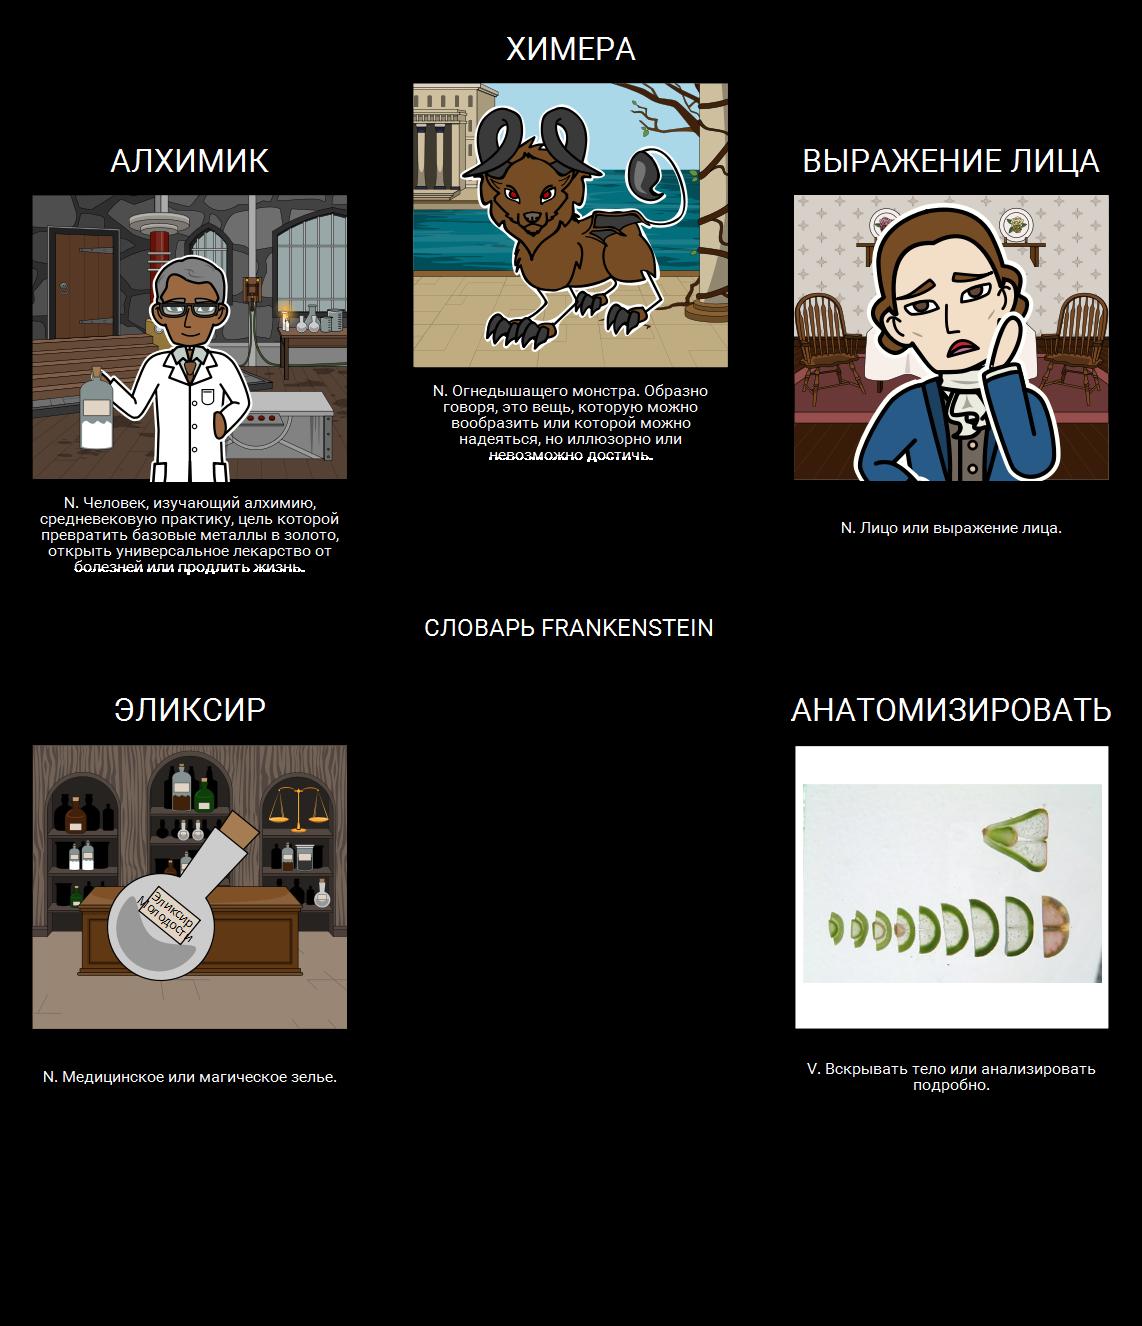 Франкенштейн Словарь